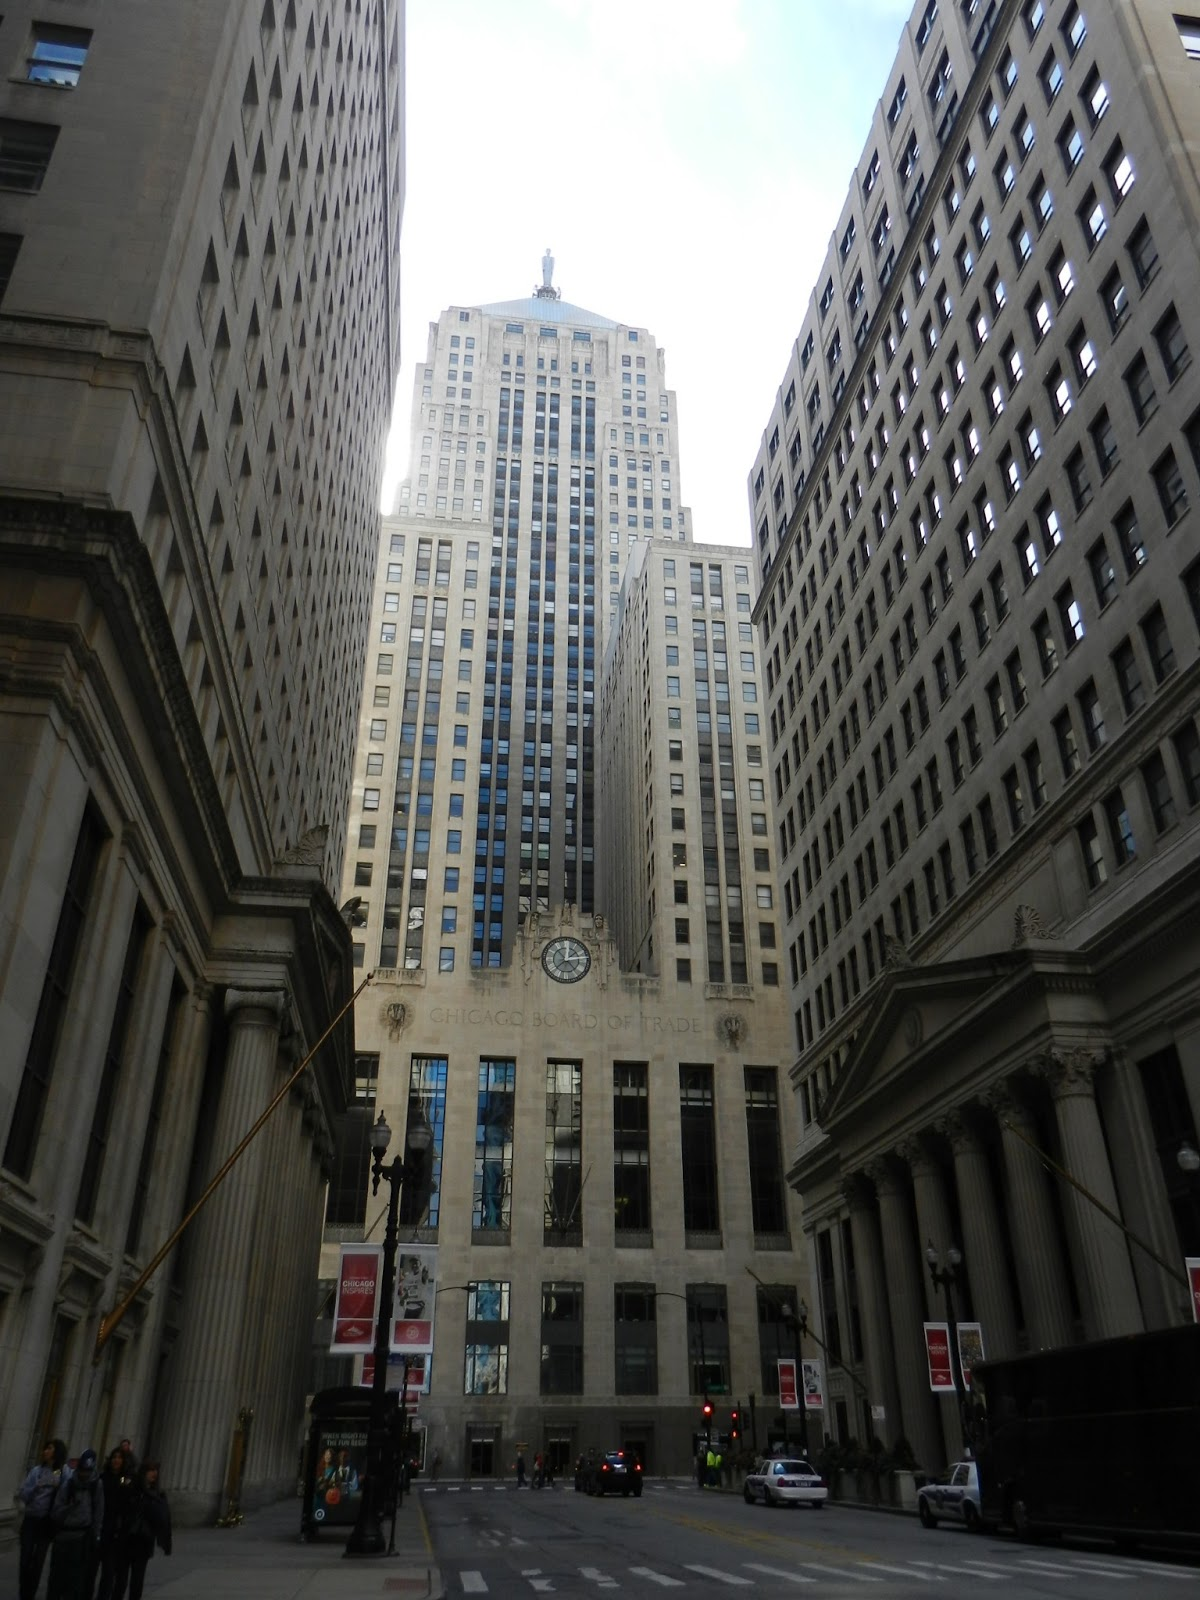 viajar, viajar, viajar: Chicago I